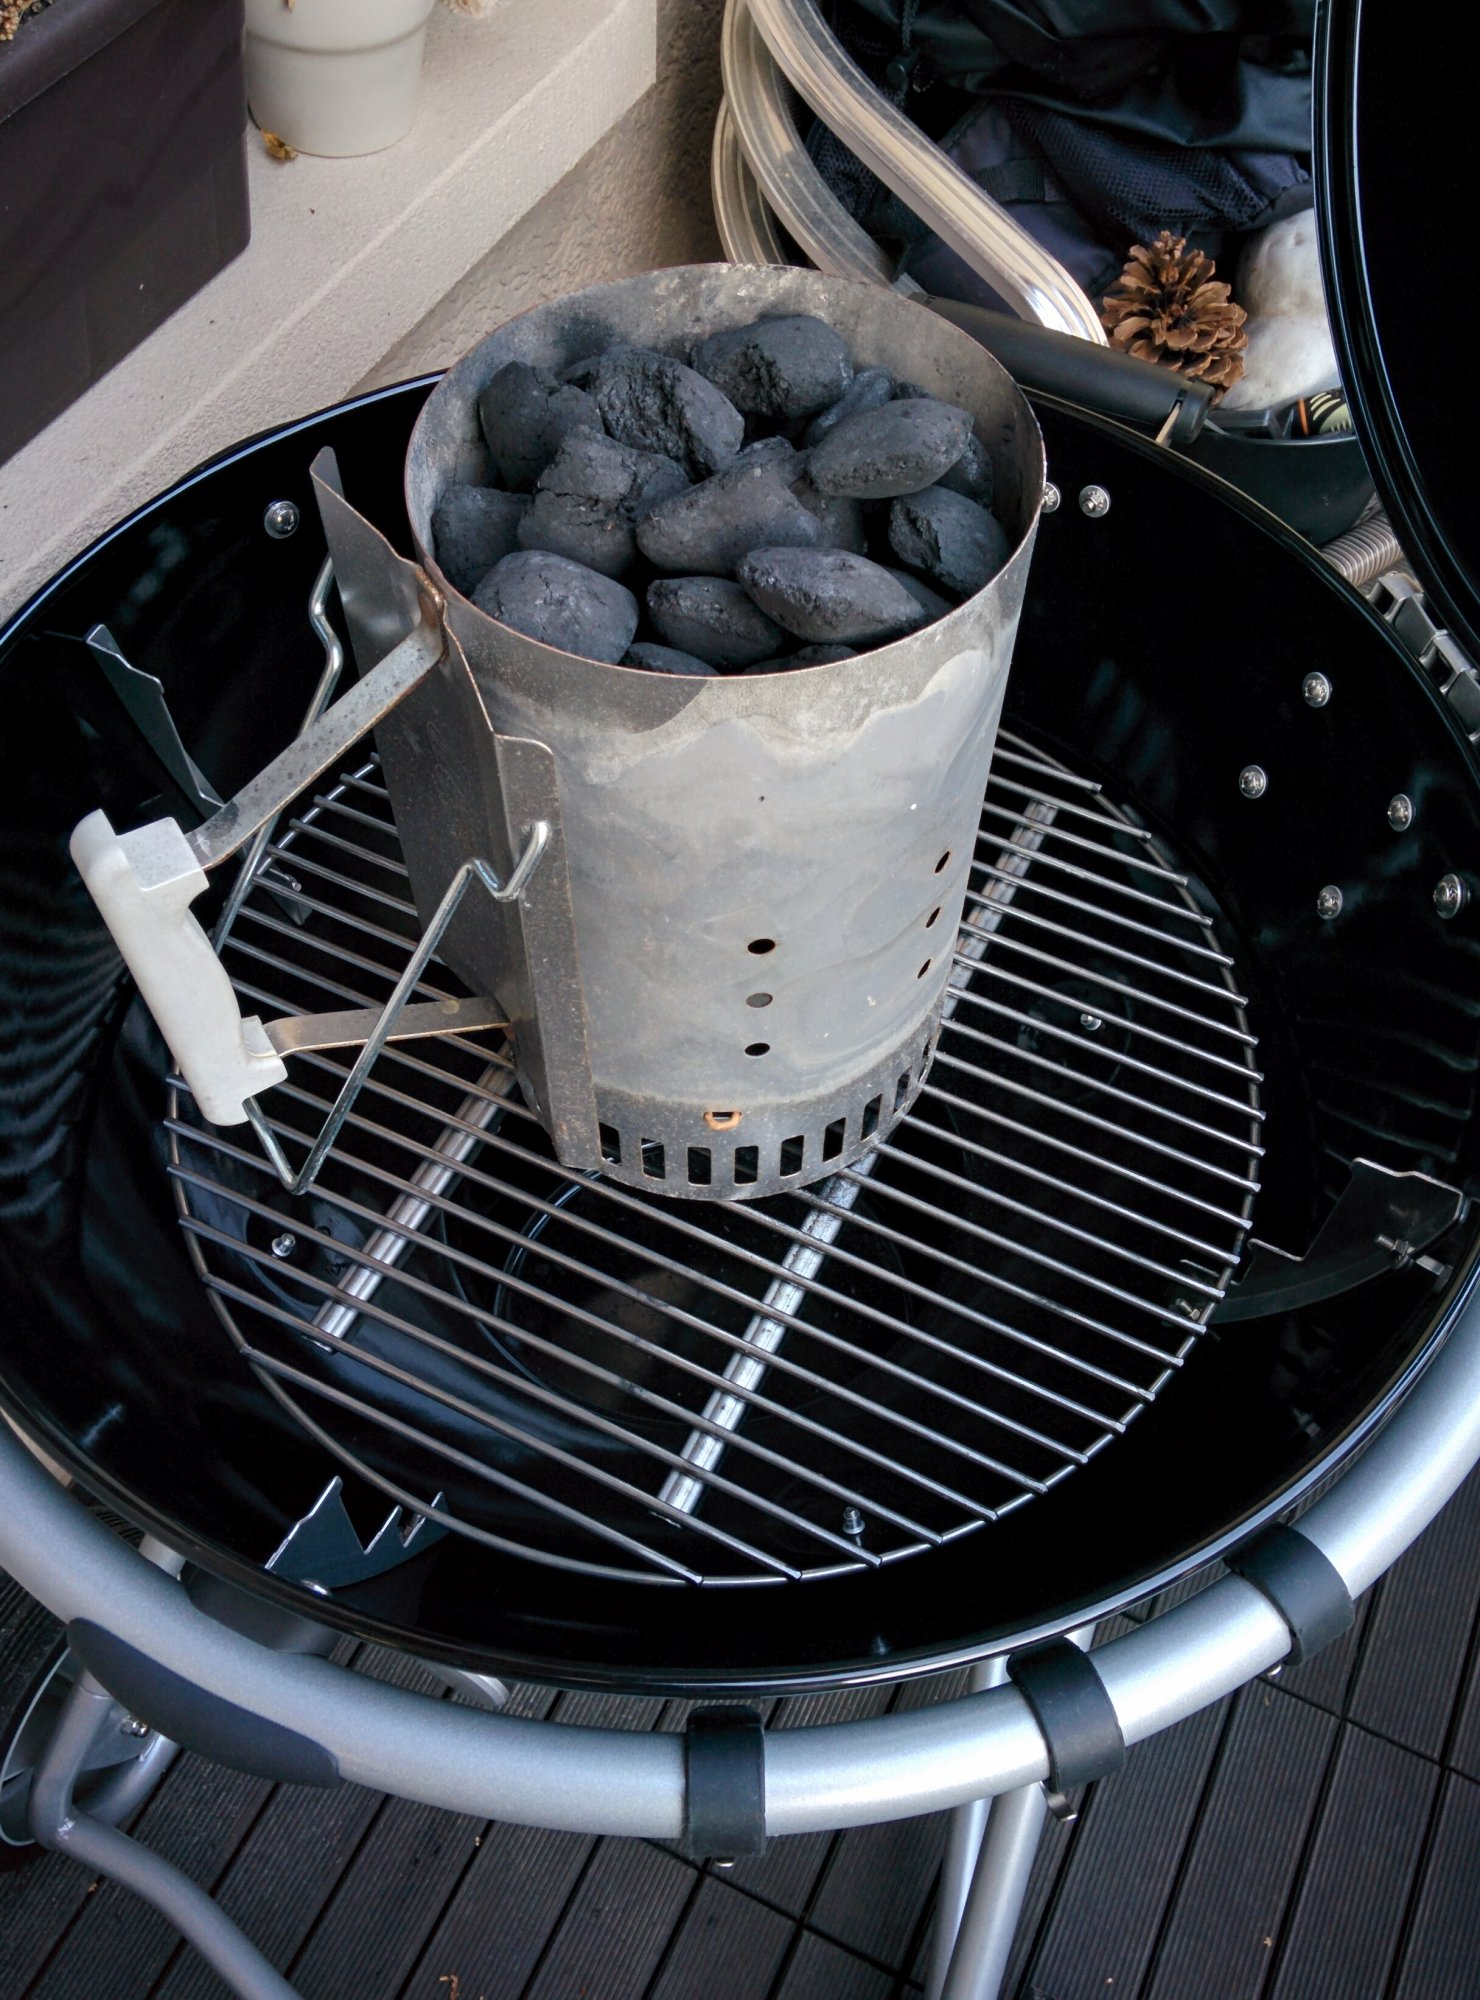 test roesle no 1 f60 air teil 2 praxistest fazit grillforum und bbq www. Black Bedroom Furniture Sets. Home Design Ideas